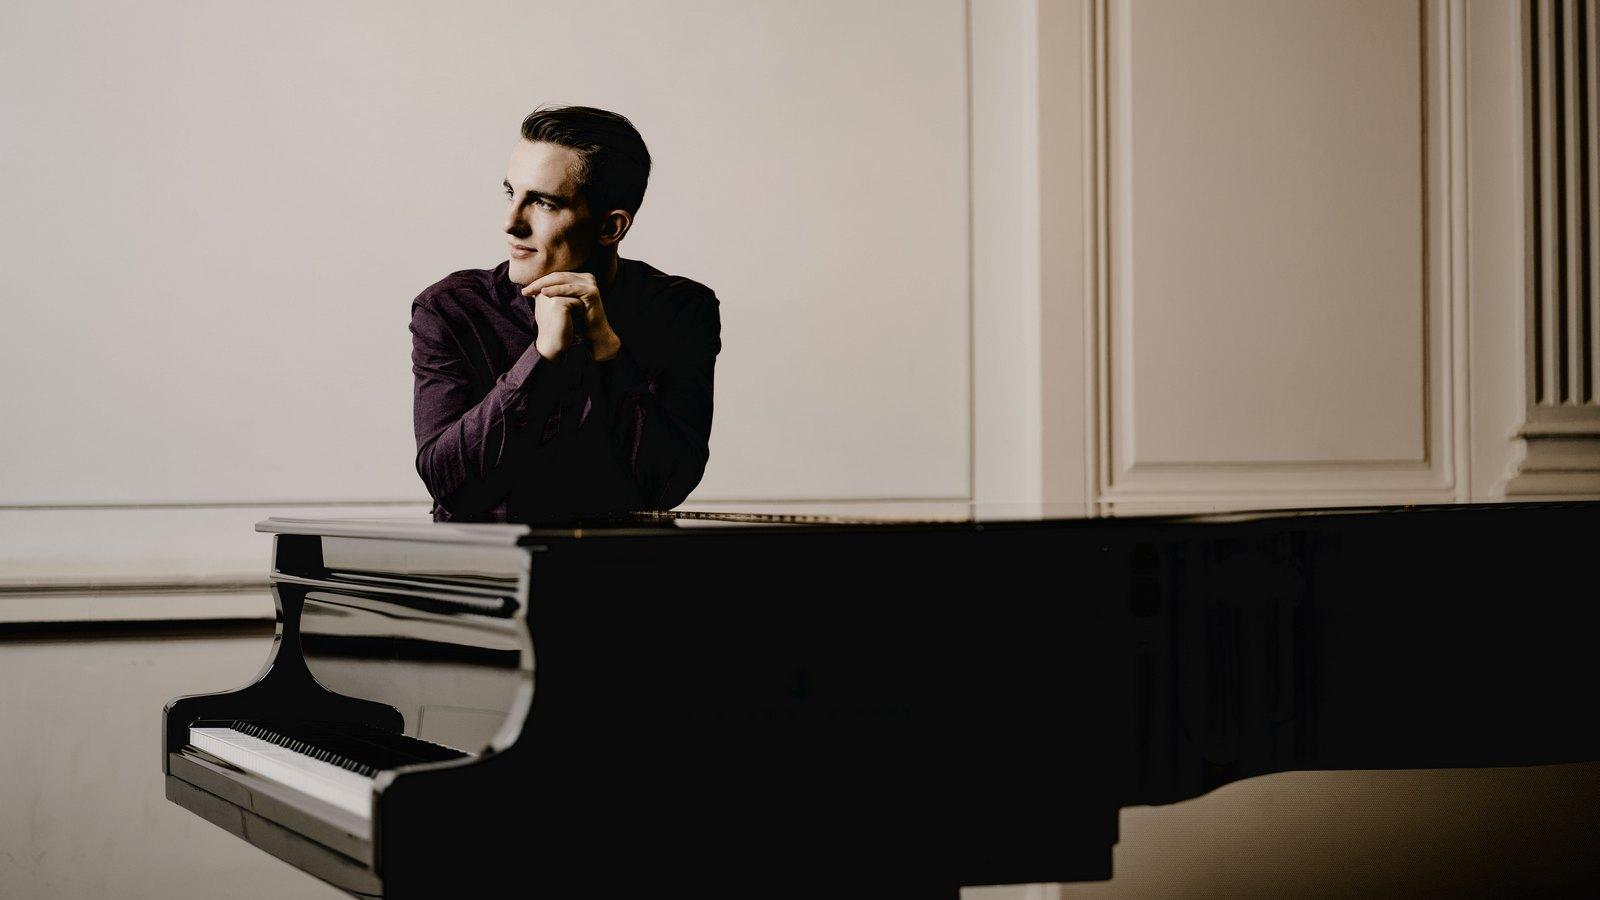 Florian Verweij - Adieu Beethoven, Hallo Liszt